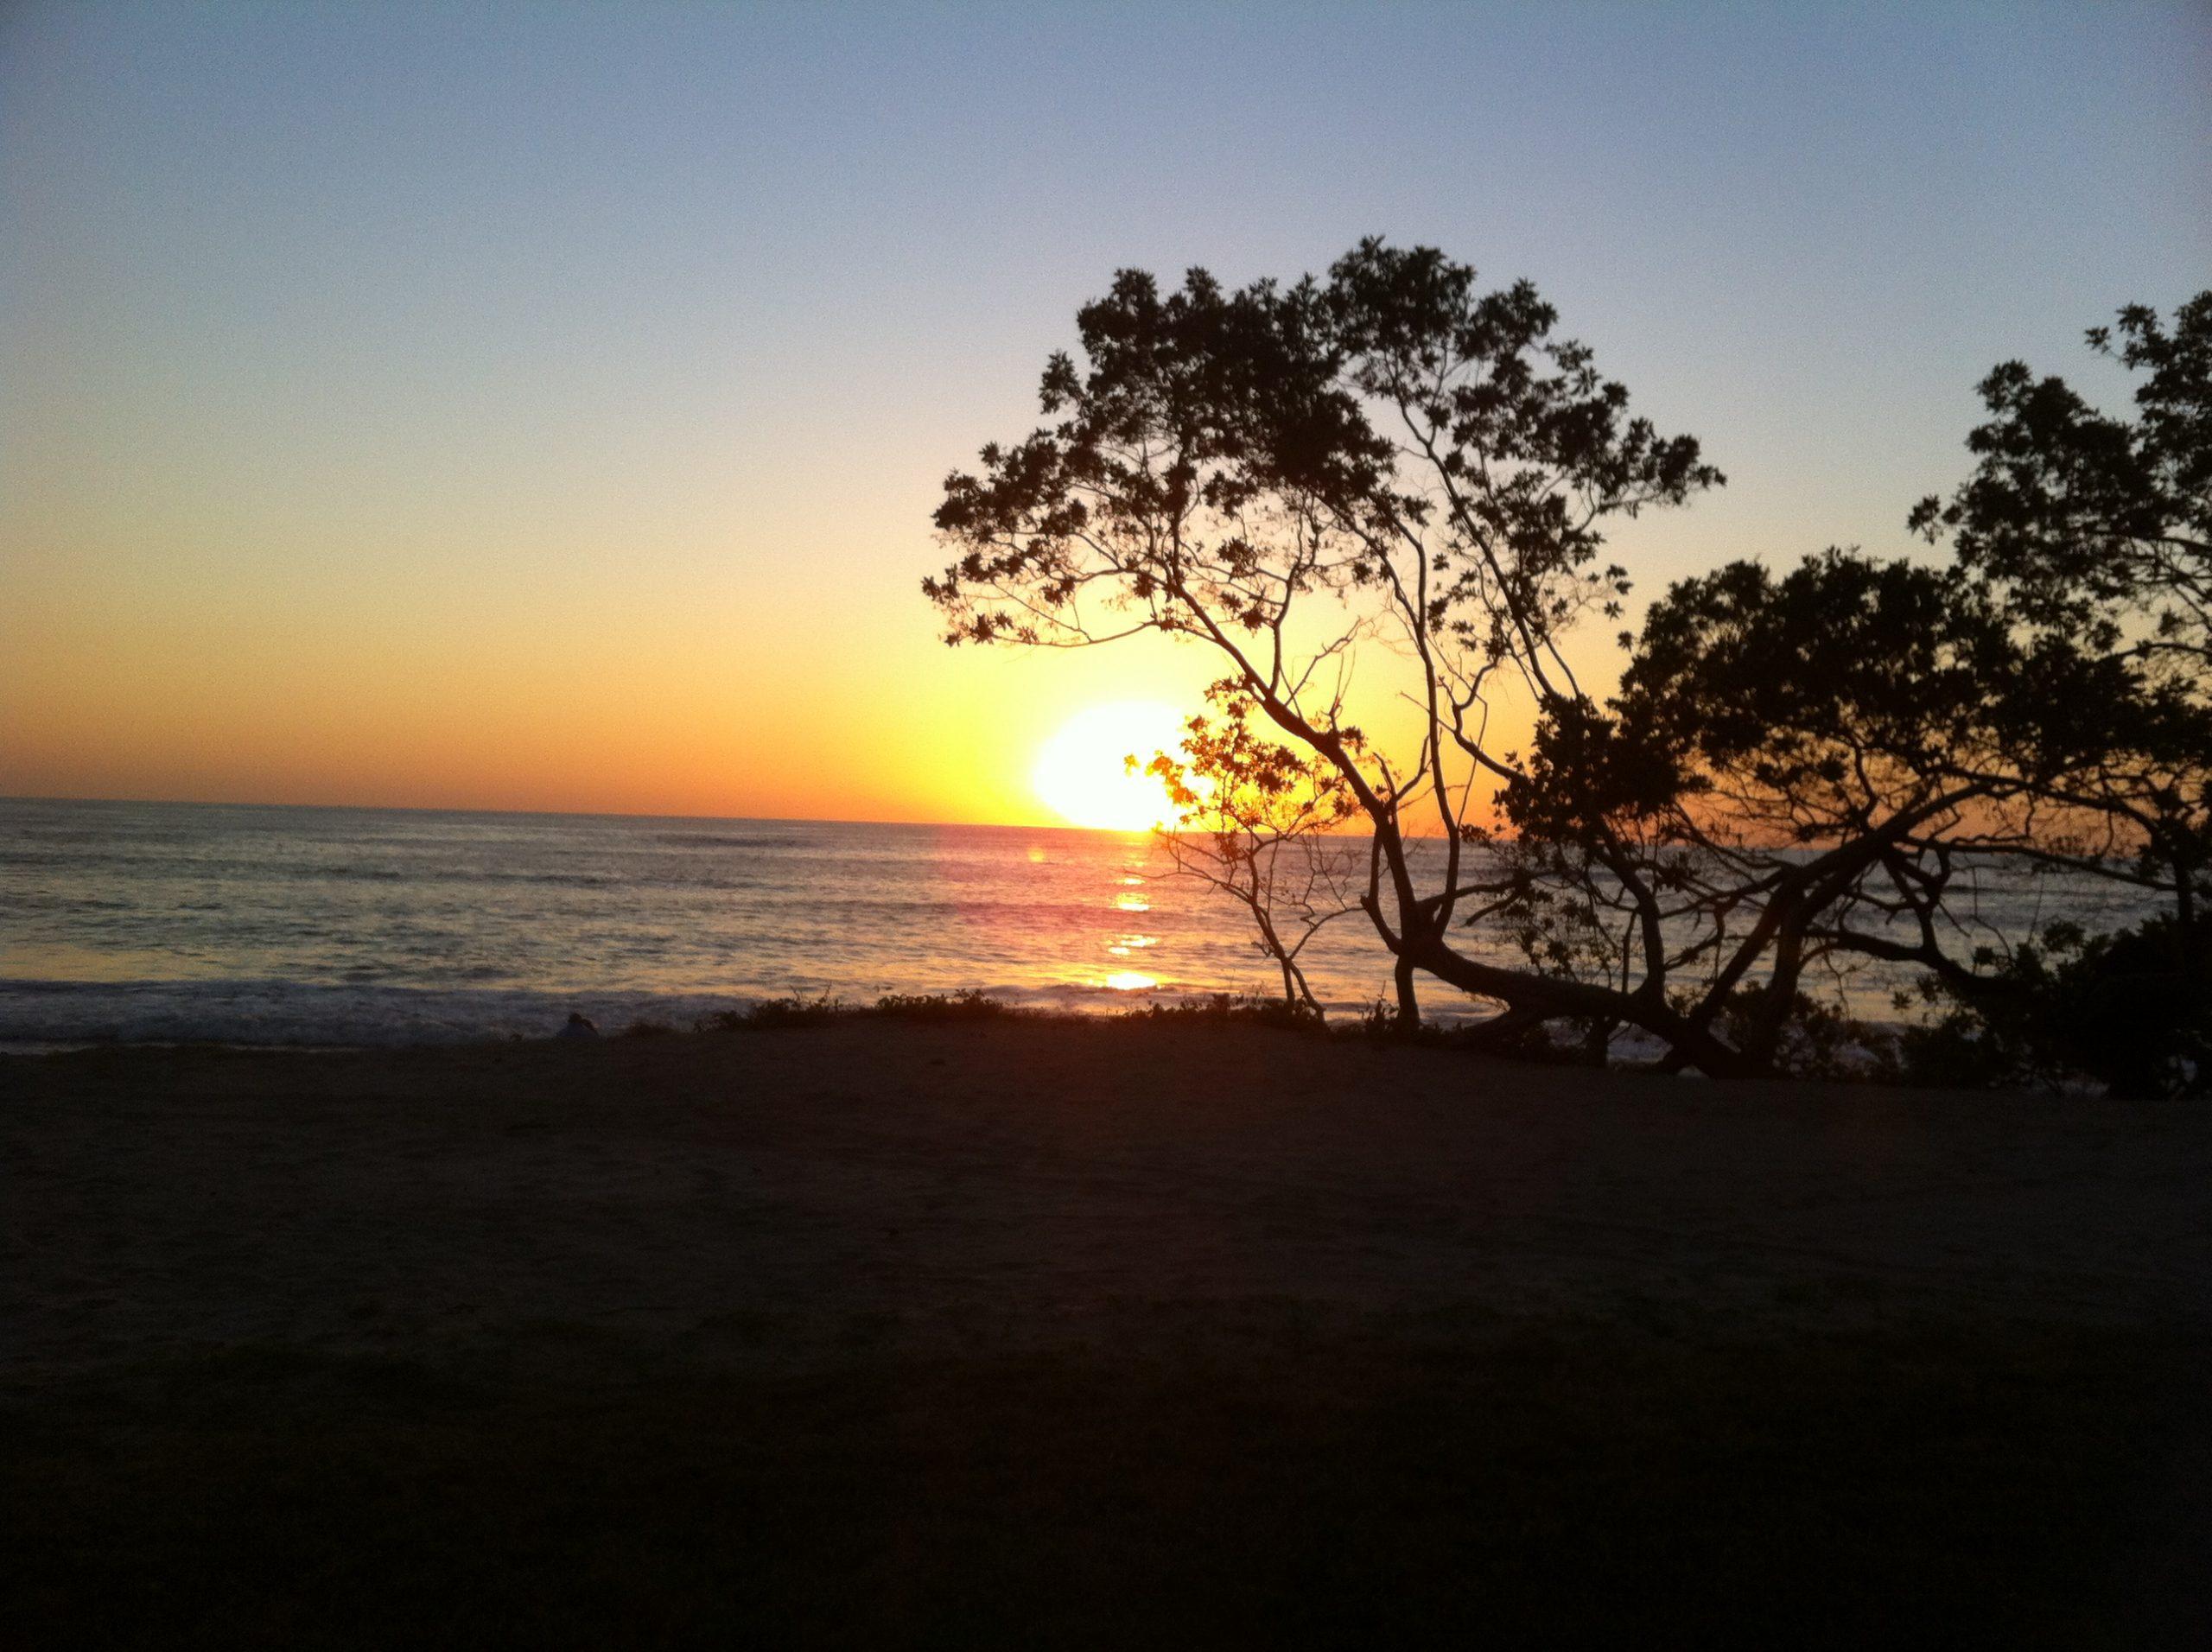 Costa Rica Blog from Houston PetTalk Editor: Day 3